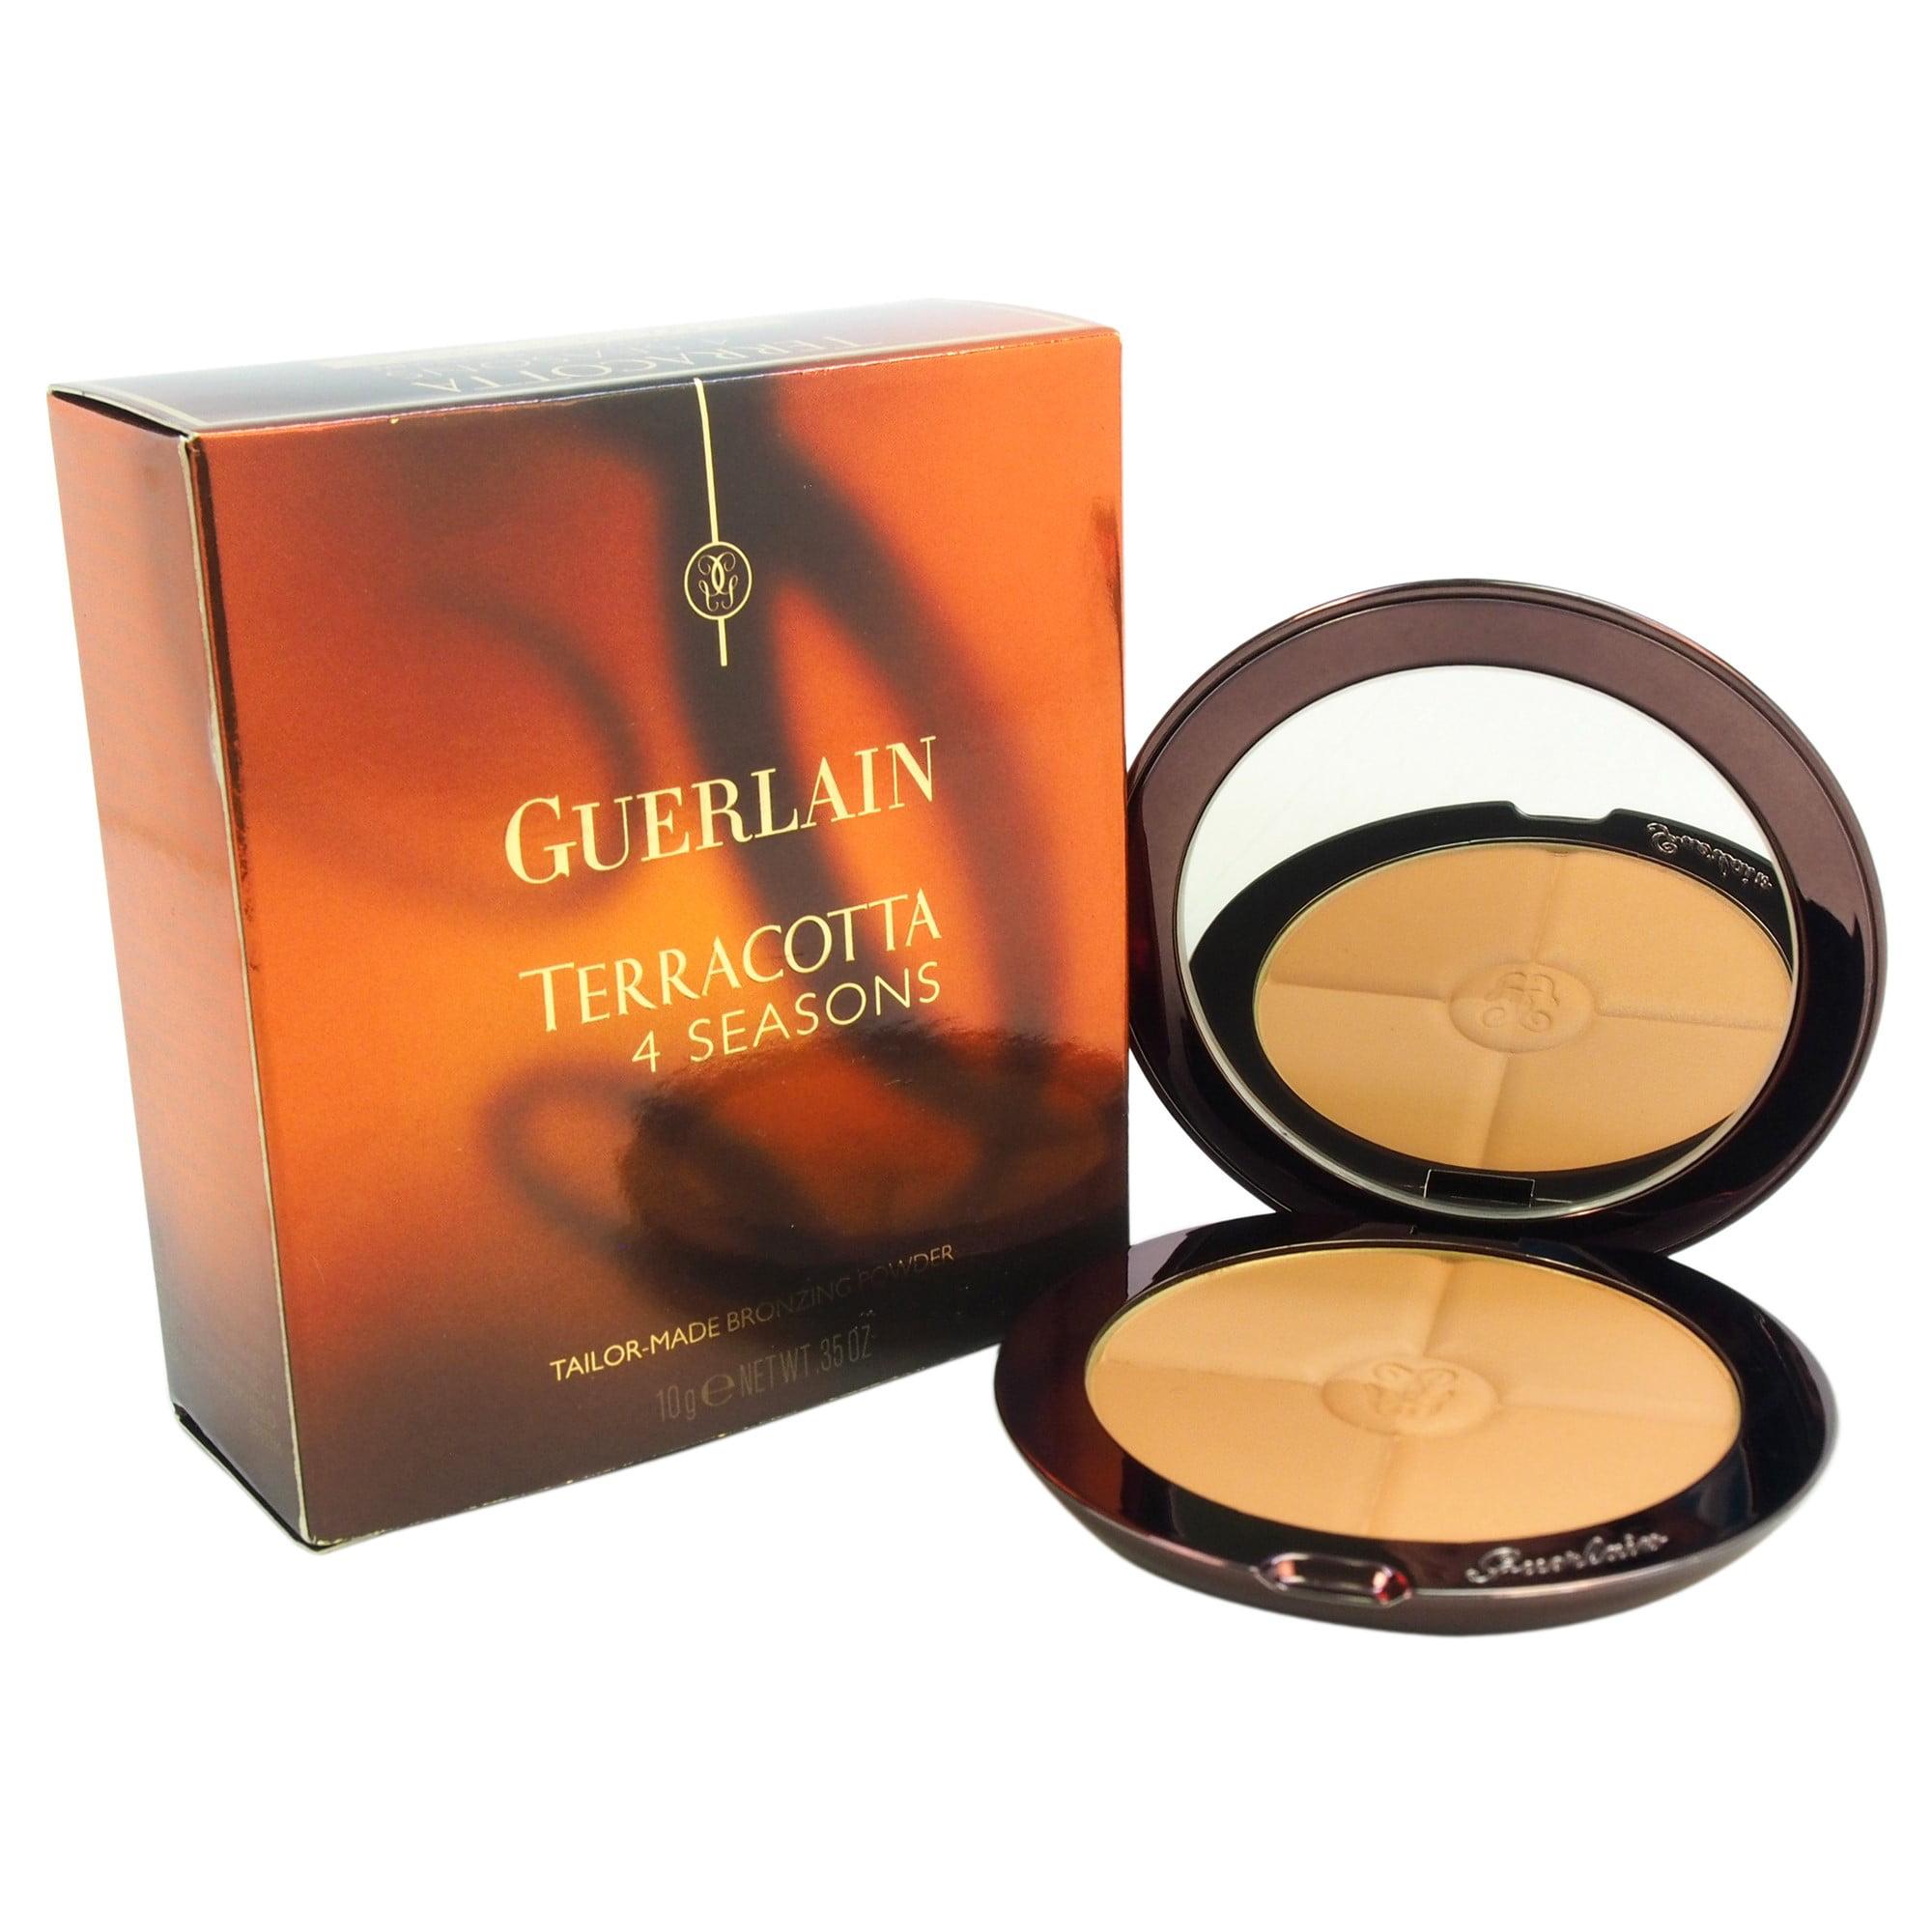 Guerlain Terracotta 4 Seasons Contour and Bronzing Powder with SPF 10, 02 Naturel Blondes, 0.35 Oz